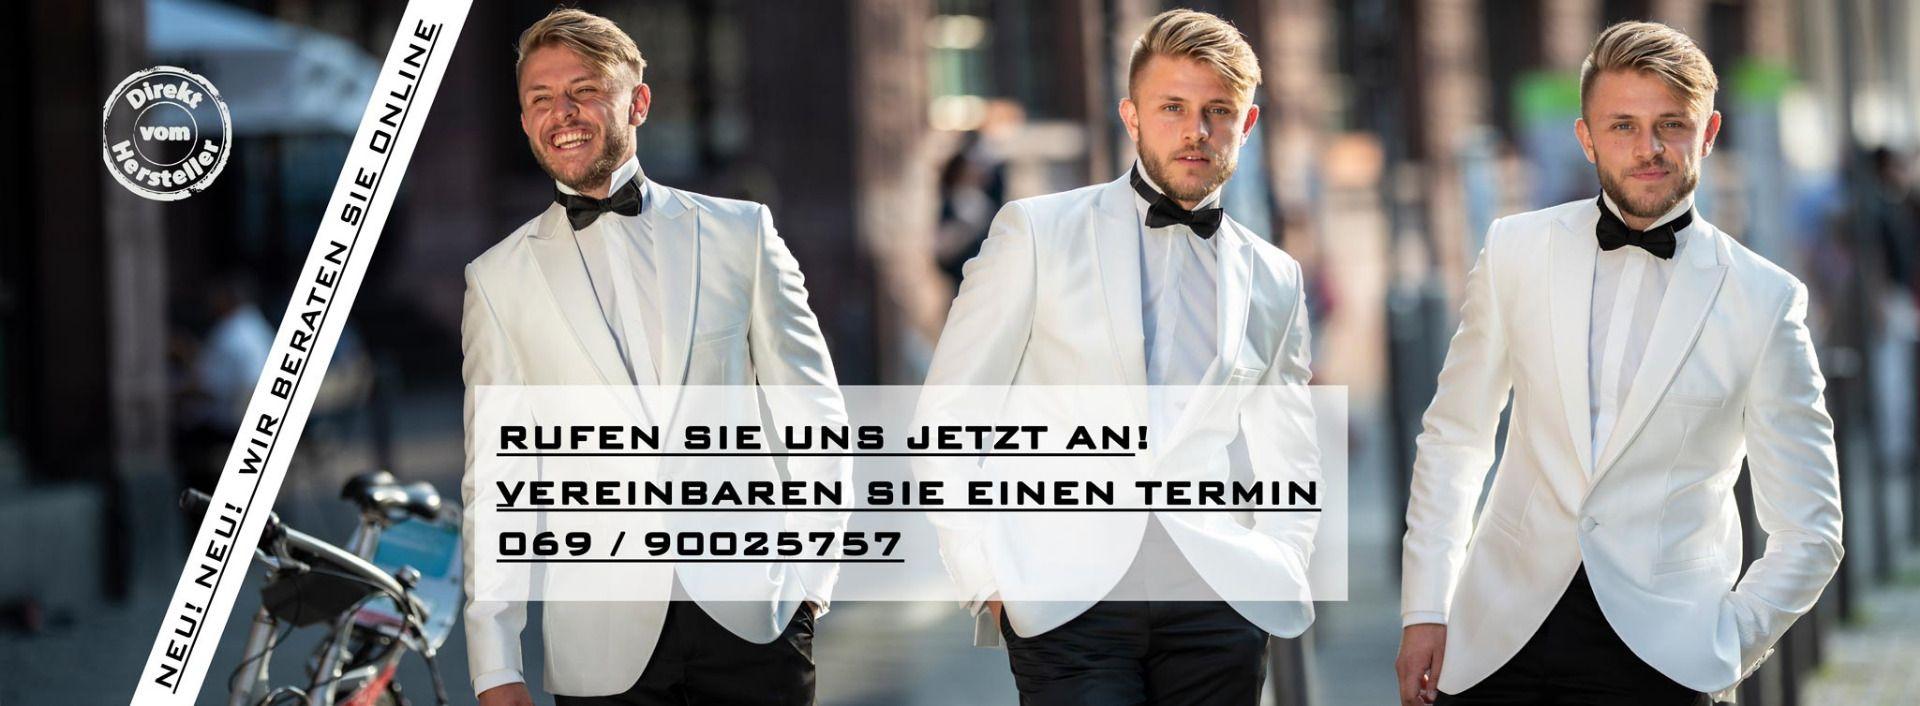 Saray Bräutigam, Hochzeitsanzüge nach Maß - Frankfurt, Köln, Stuttgart